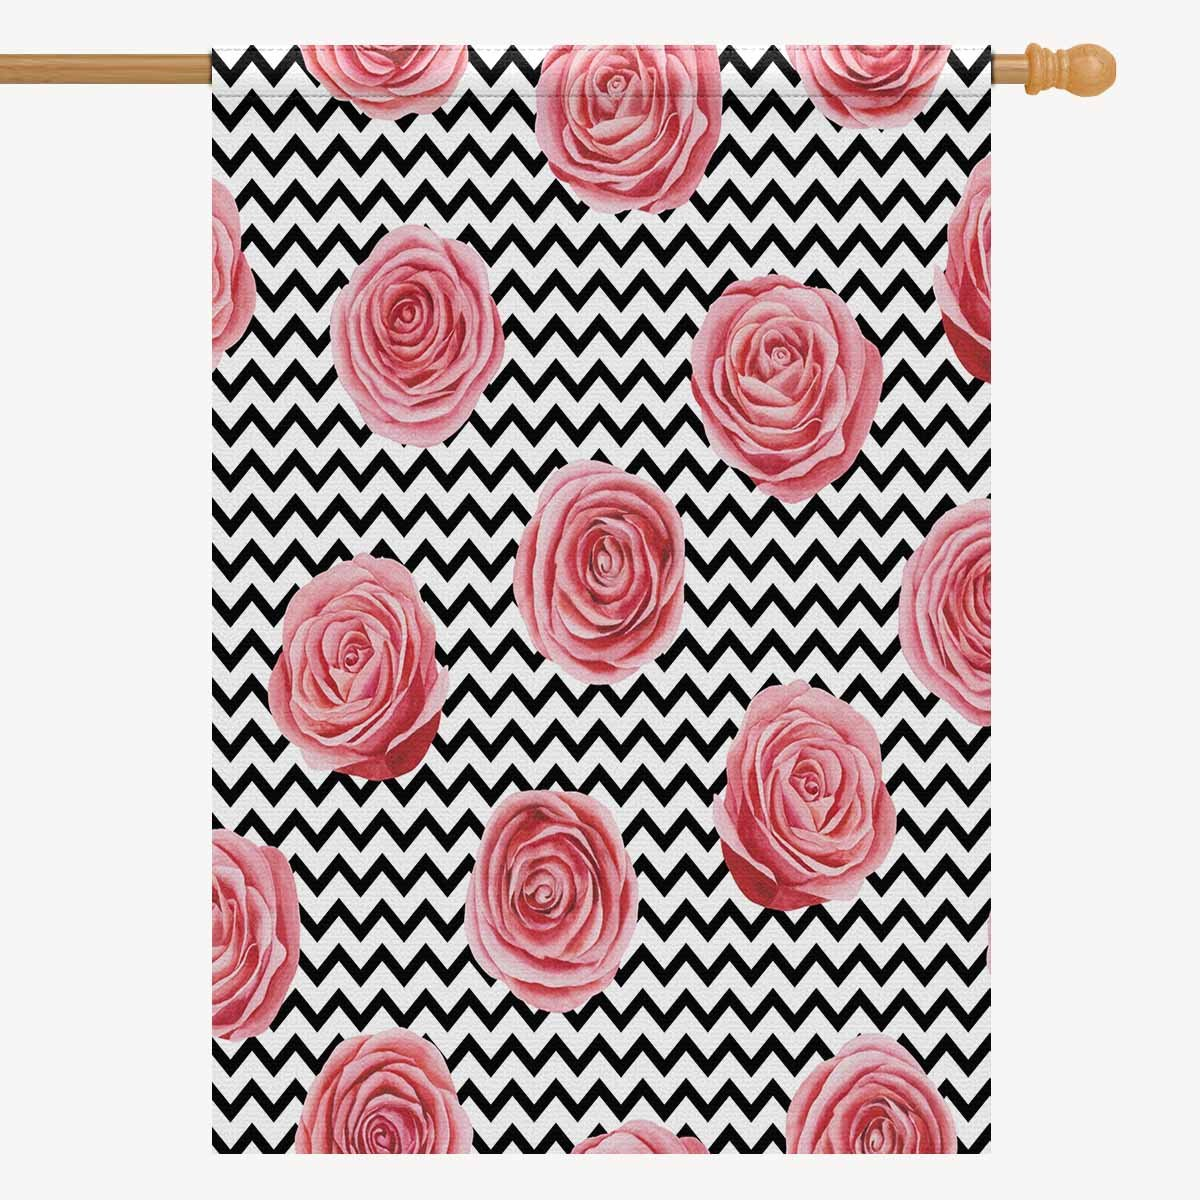 2d28cb741370 Amazon.com : INTERESTPRINT Fashion Chevron Zigzag with Pink Rose ...